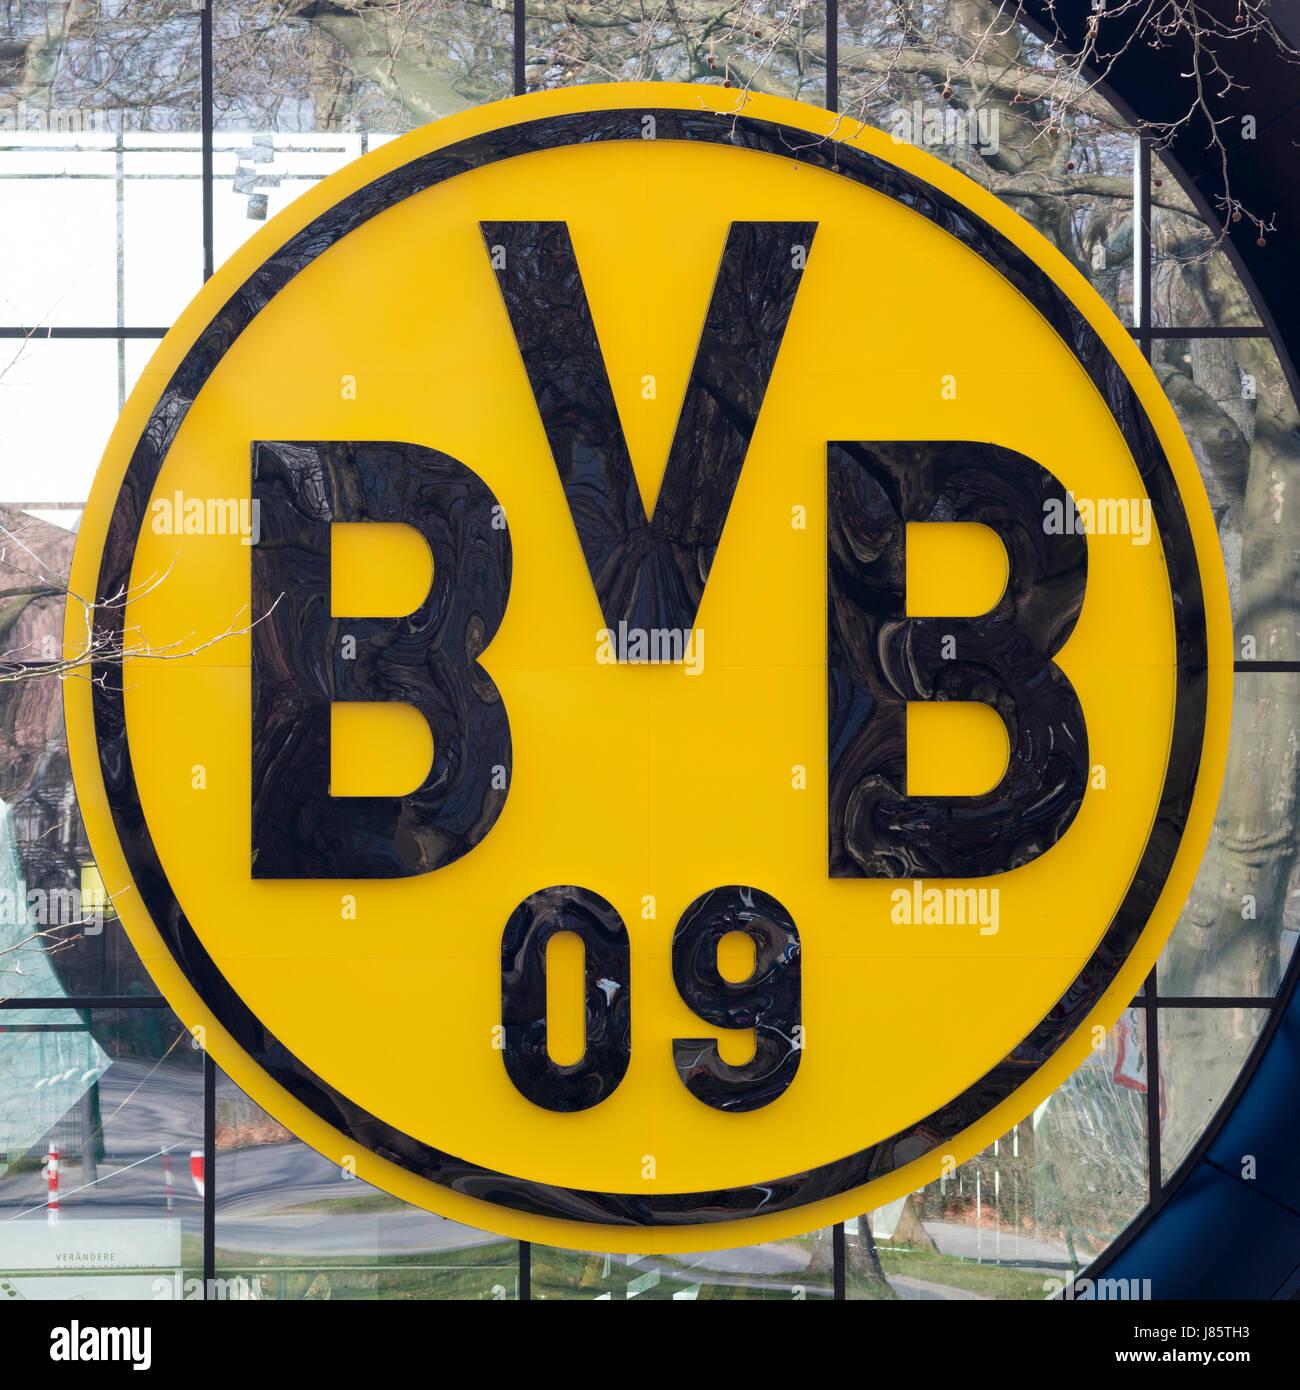 BVB Logo, Signal Iduna Park, Dortmund, Ruhr area, North Rhine-Westphalia, Germany - Stock Image